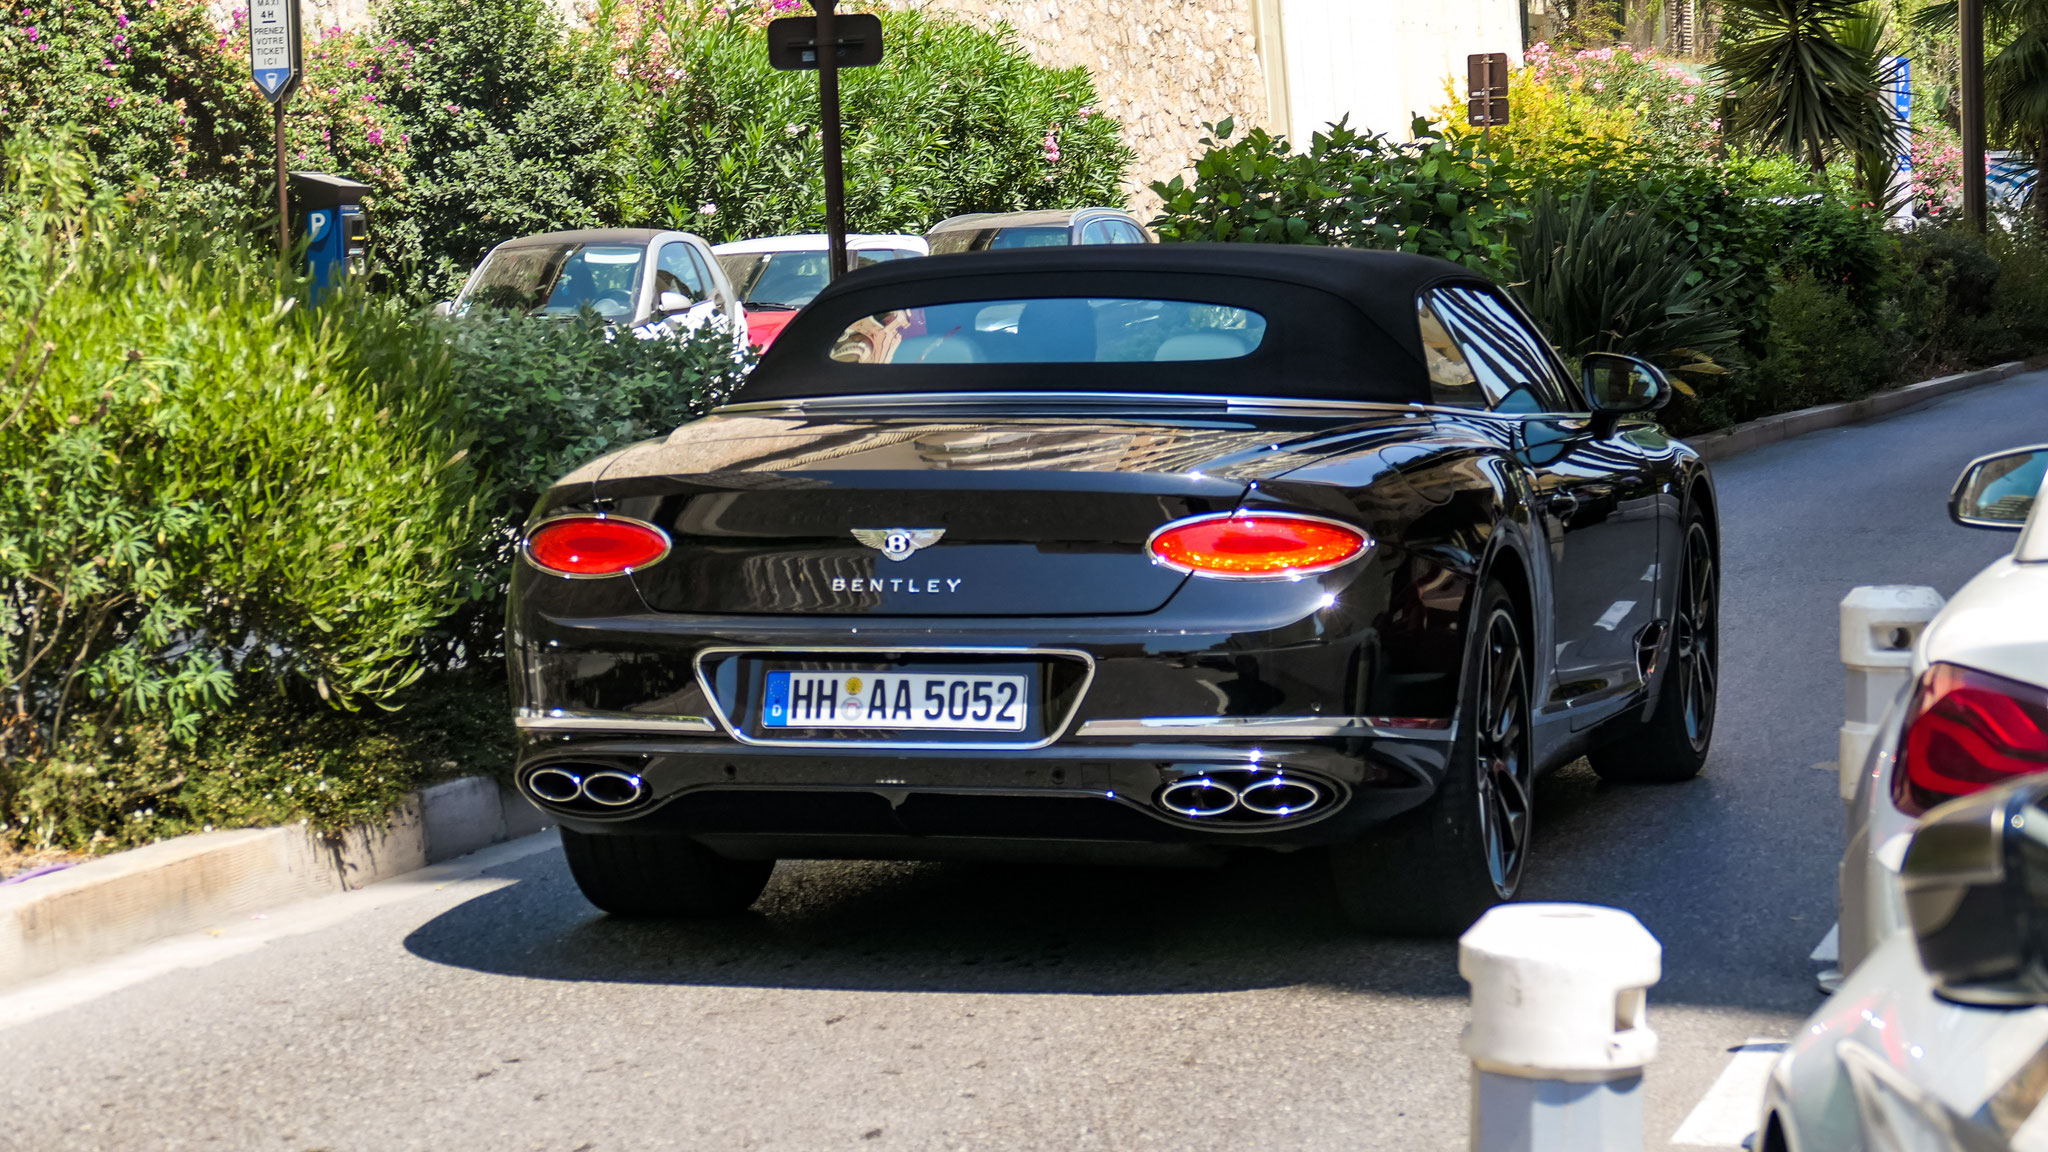 Bentley Continental GTC - HH-AA-5052